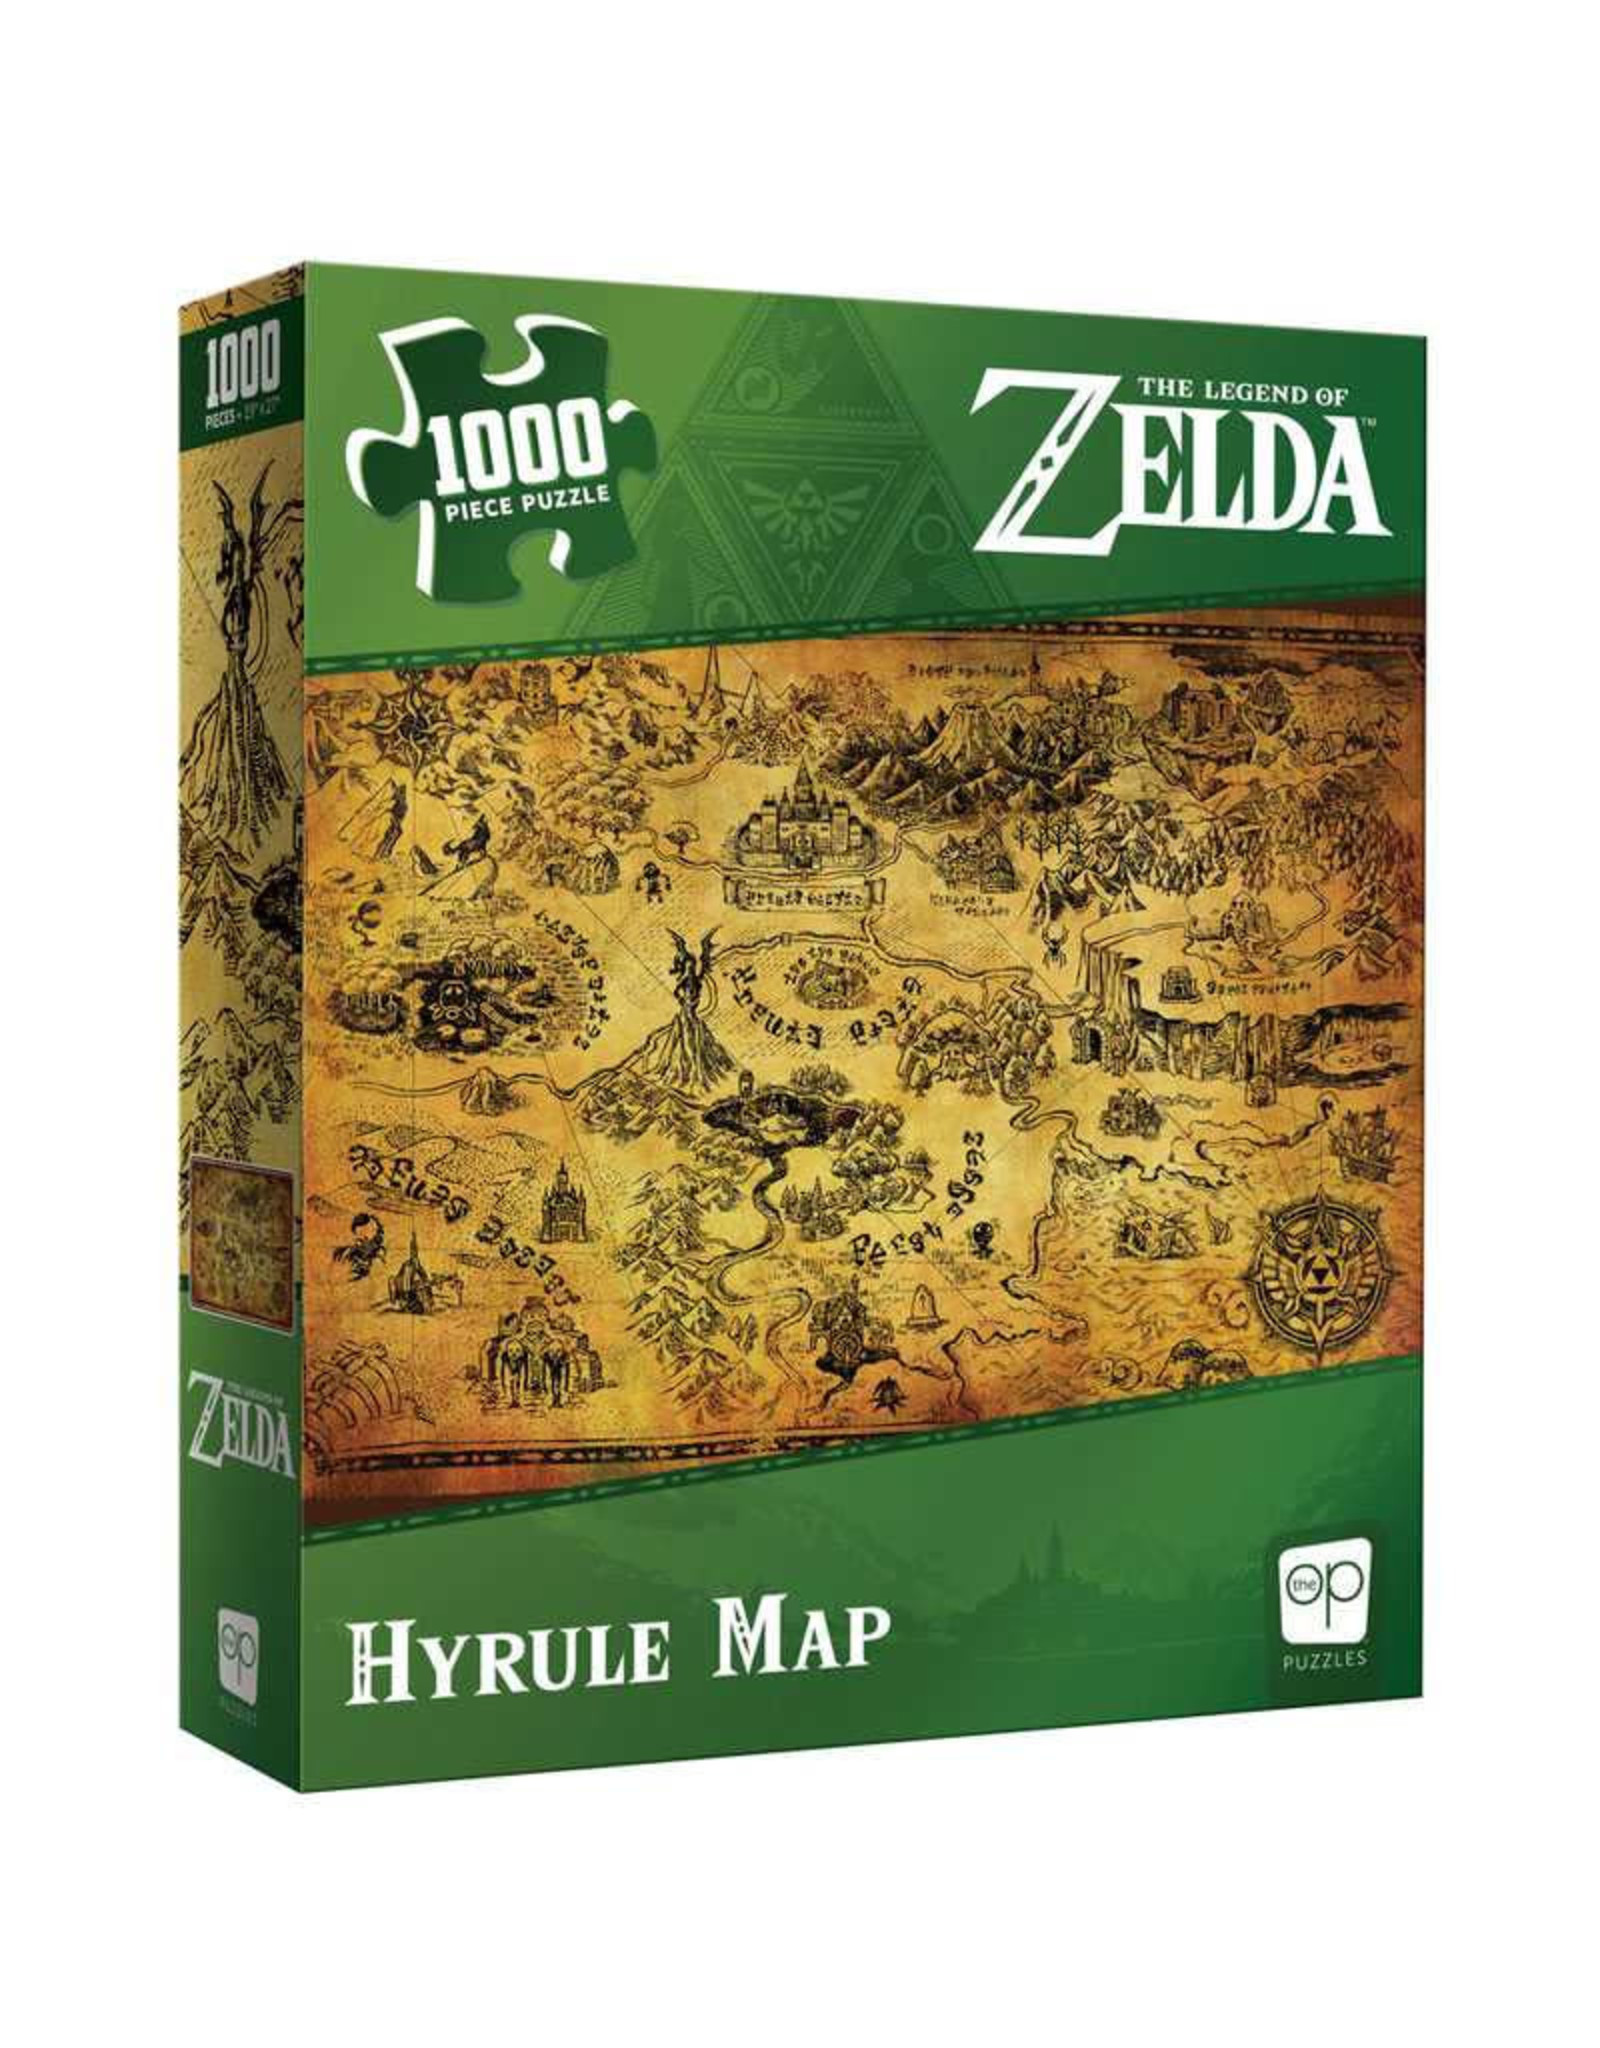 USAopoly Zelda Hyrule Map Puzzle 1000 PCS